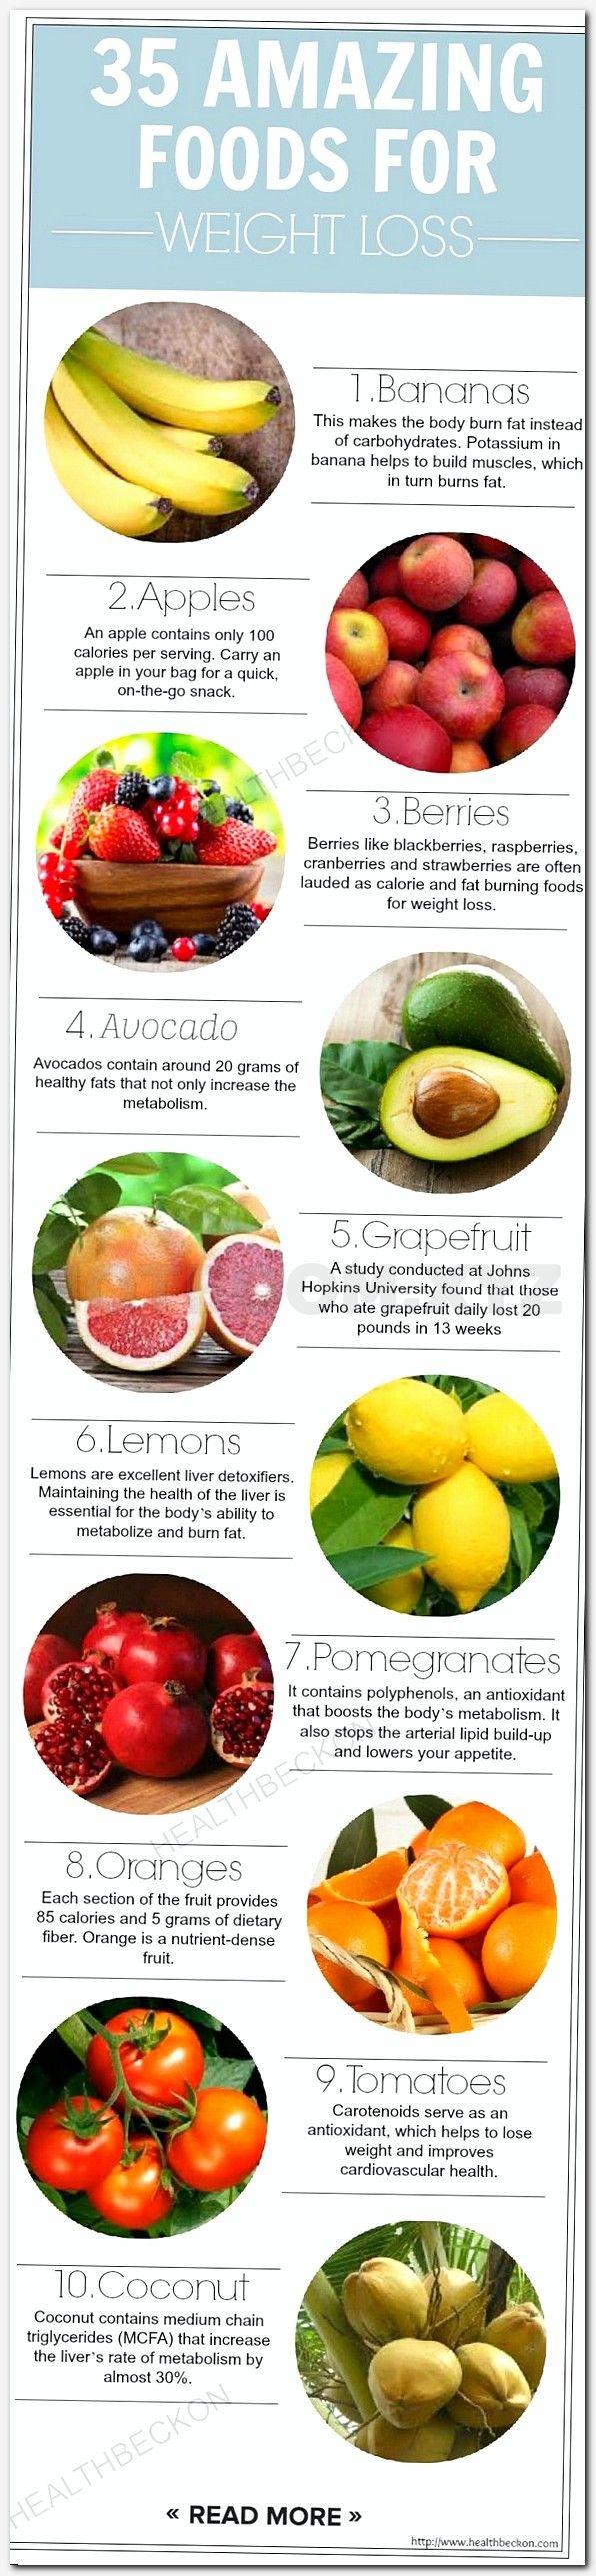 Best 25+ Diverticulitis diet ideas on Pinterest | Fiber ...